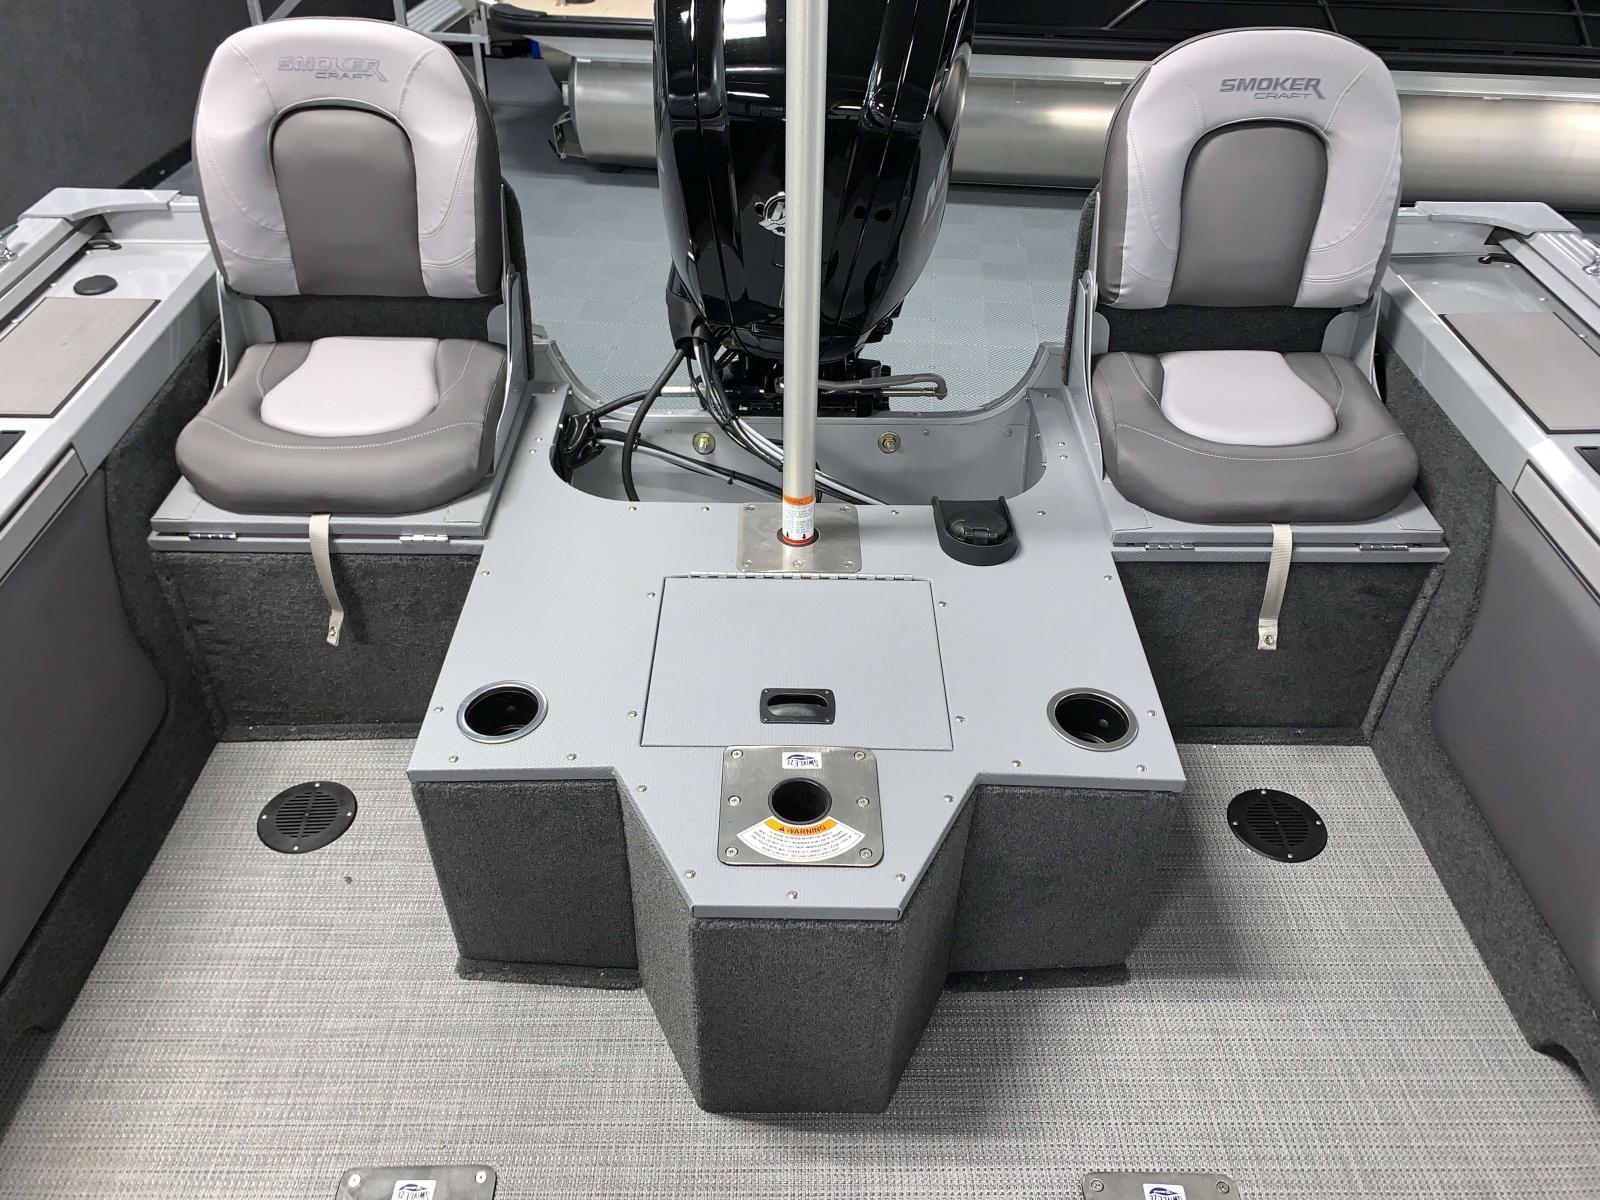 Flip-Up Rear Jump Seats of a 2020 Smoker Craft 172 Explorer Fish And Ski Boat